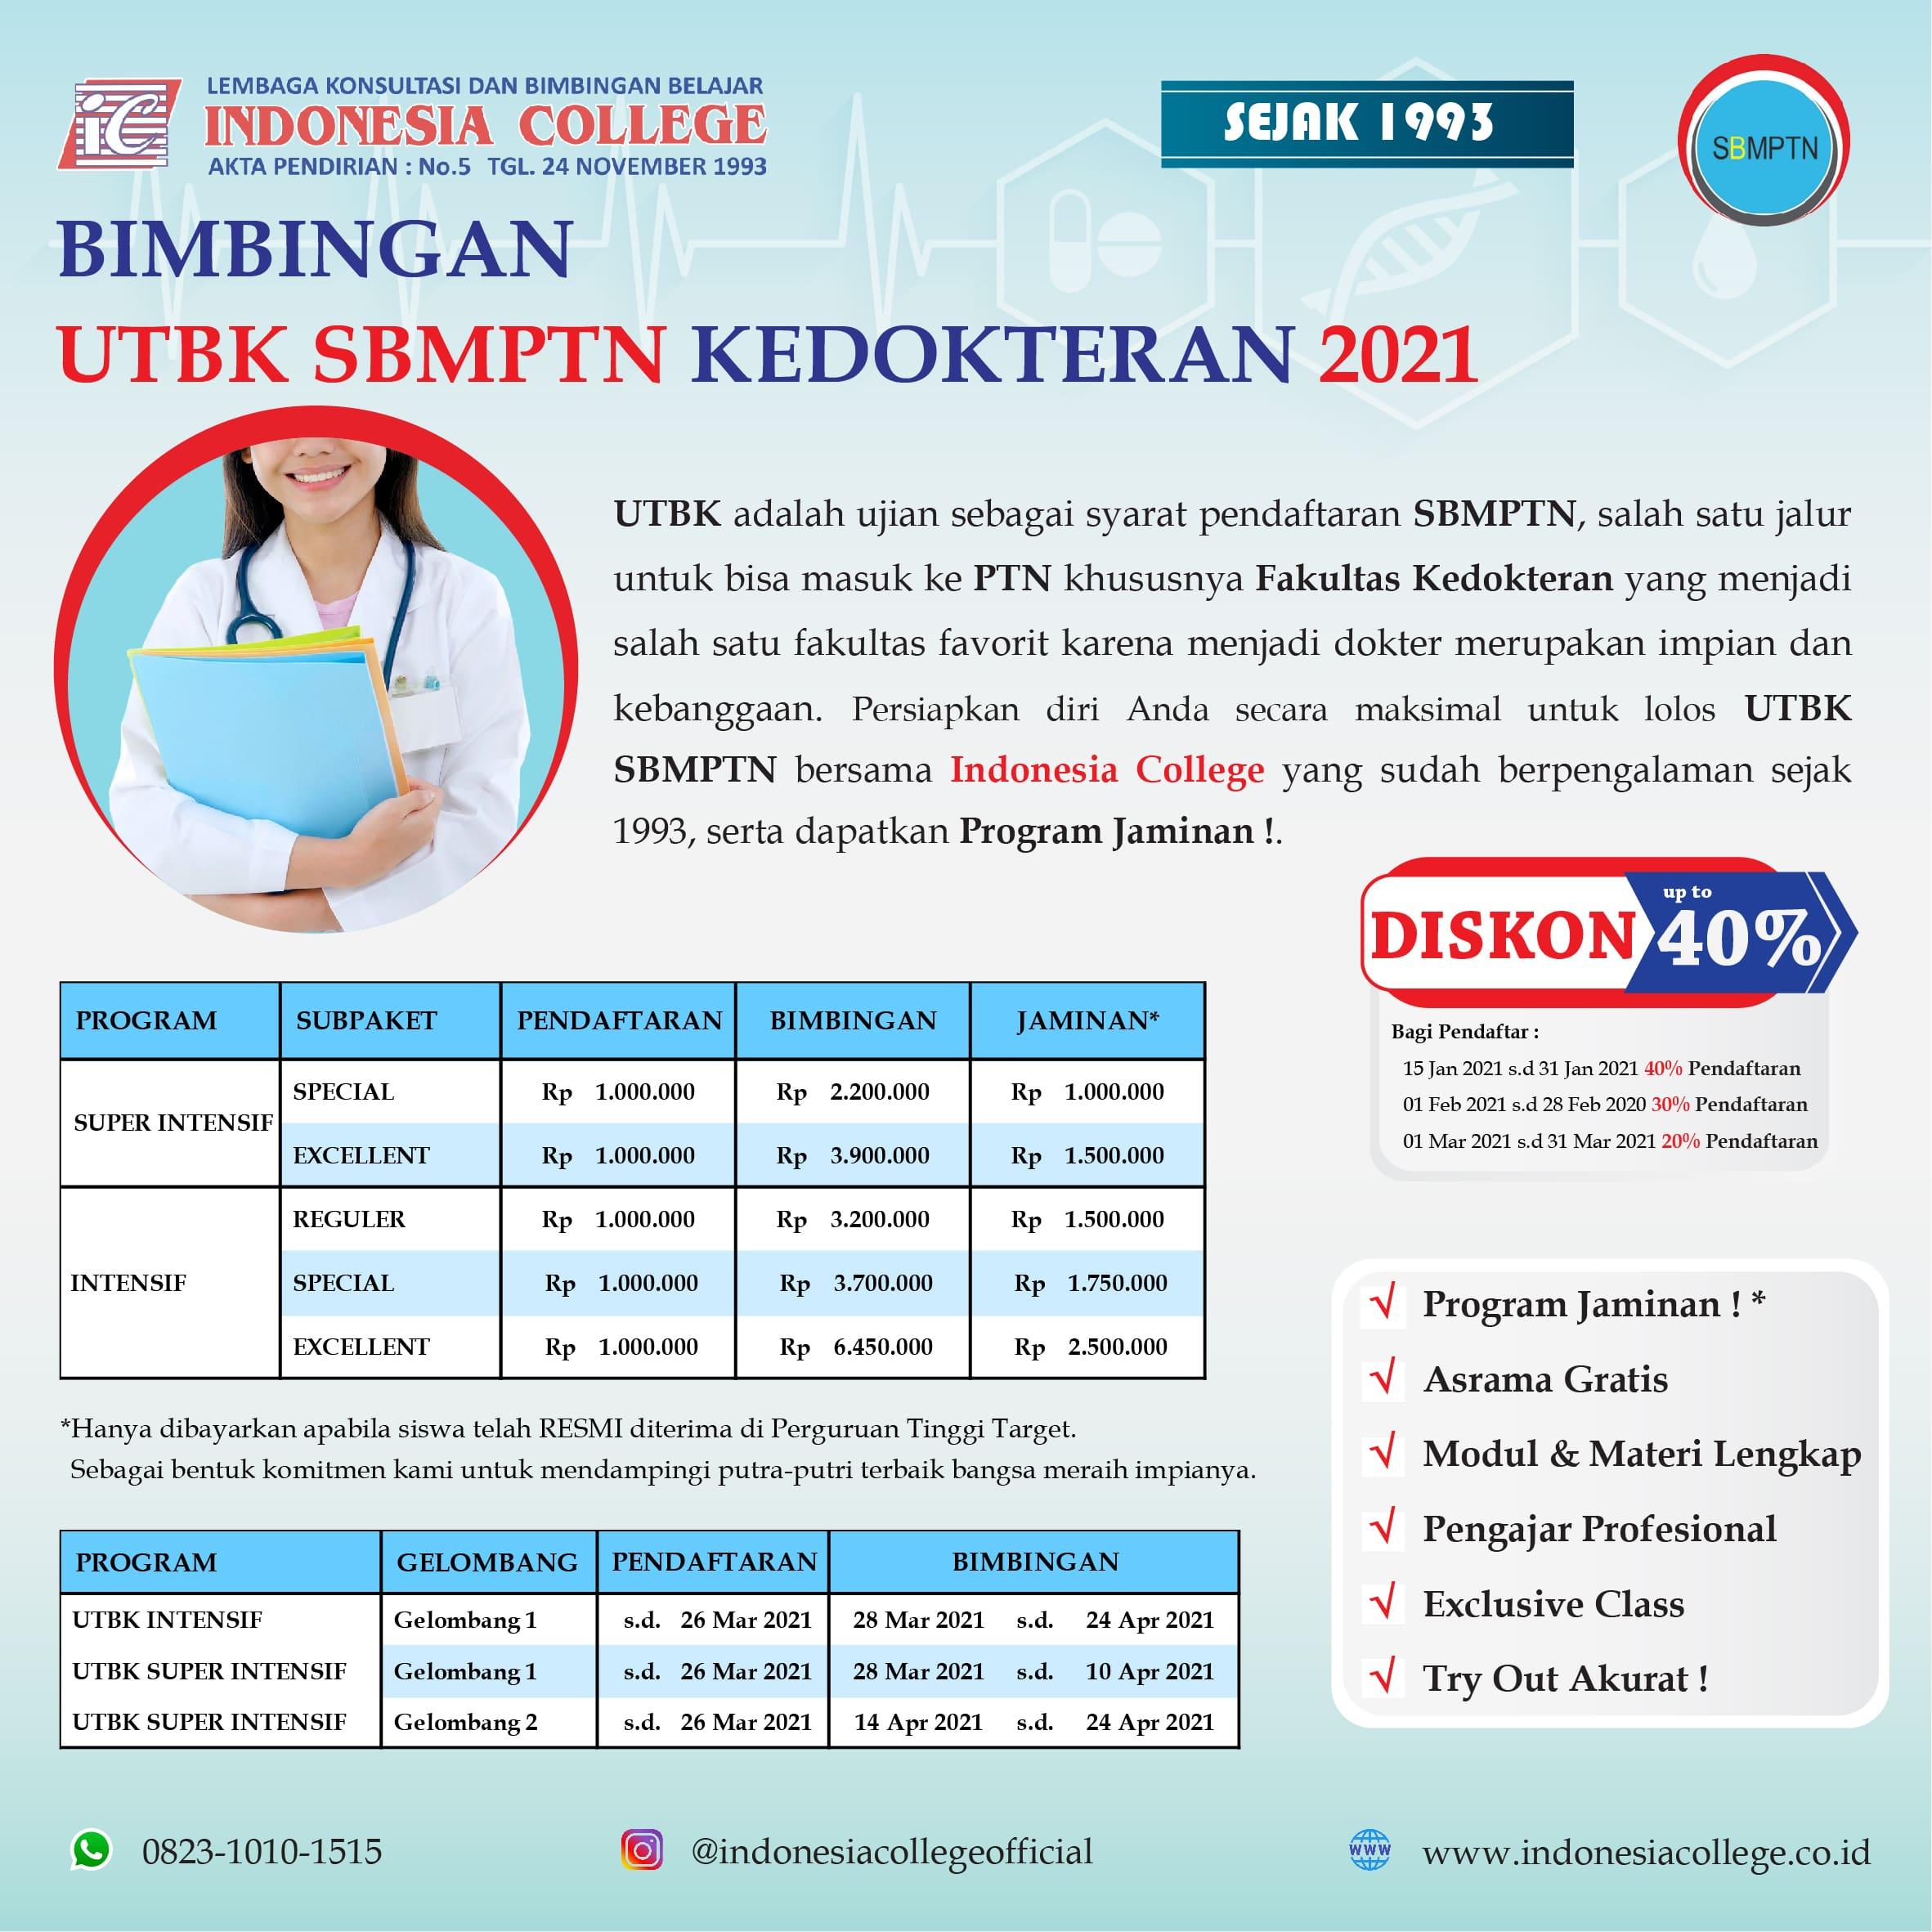 BIMBEL UTBK-SBMPTN 2021 (HARGA) PART-01-min